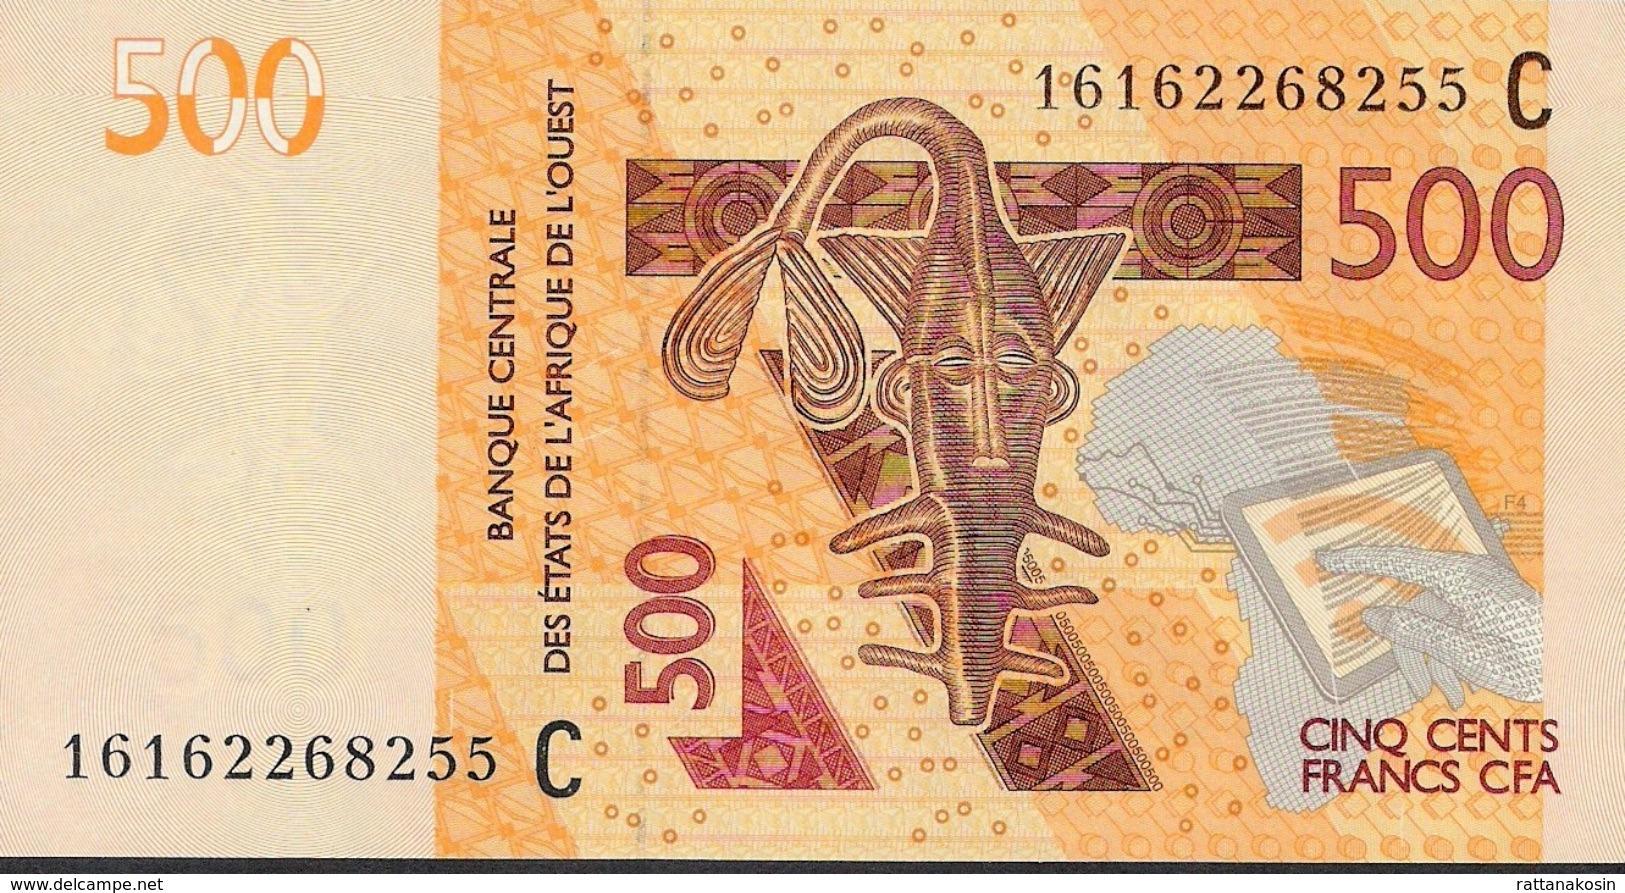 W.A.S. BURKINA FASO LETTER C P619Ce 500 FRANCS (20)16 2016 UNC. - Burkina Faso